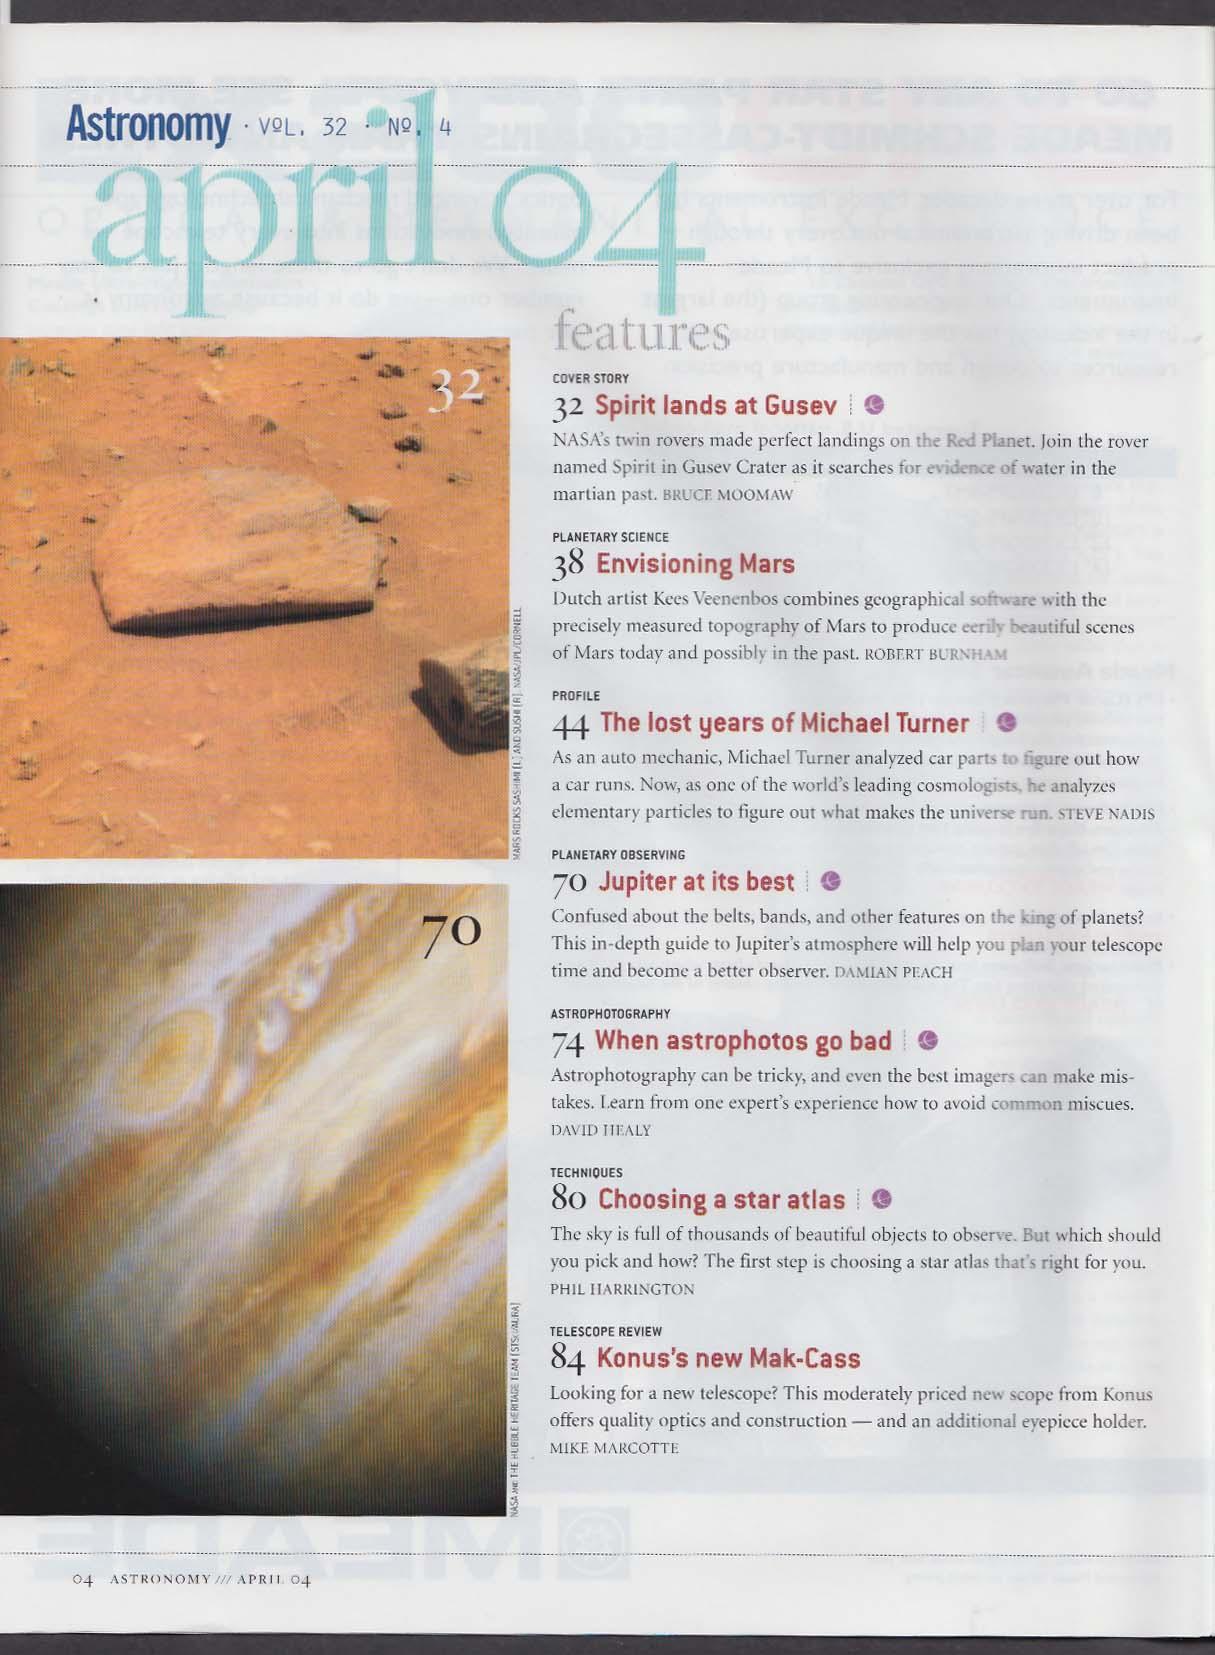 ASTRONOMY Mars Gusev Rovers David Levy Konus Mak-Cass Michael Turner 4 2004